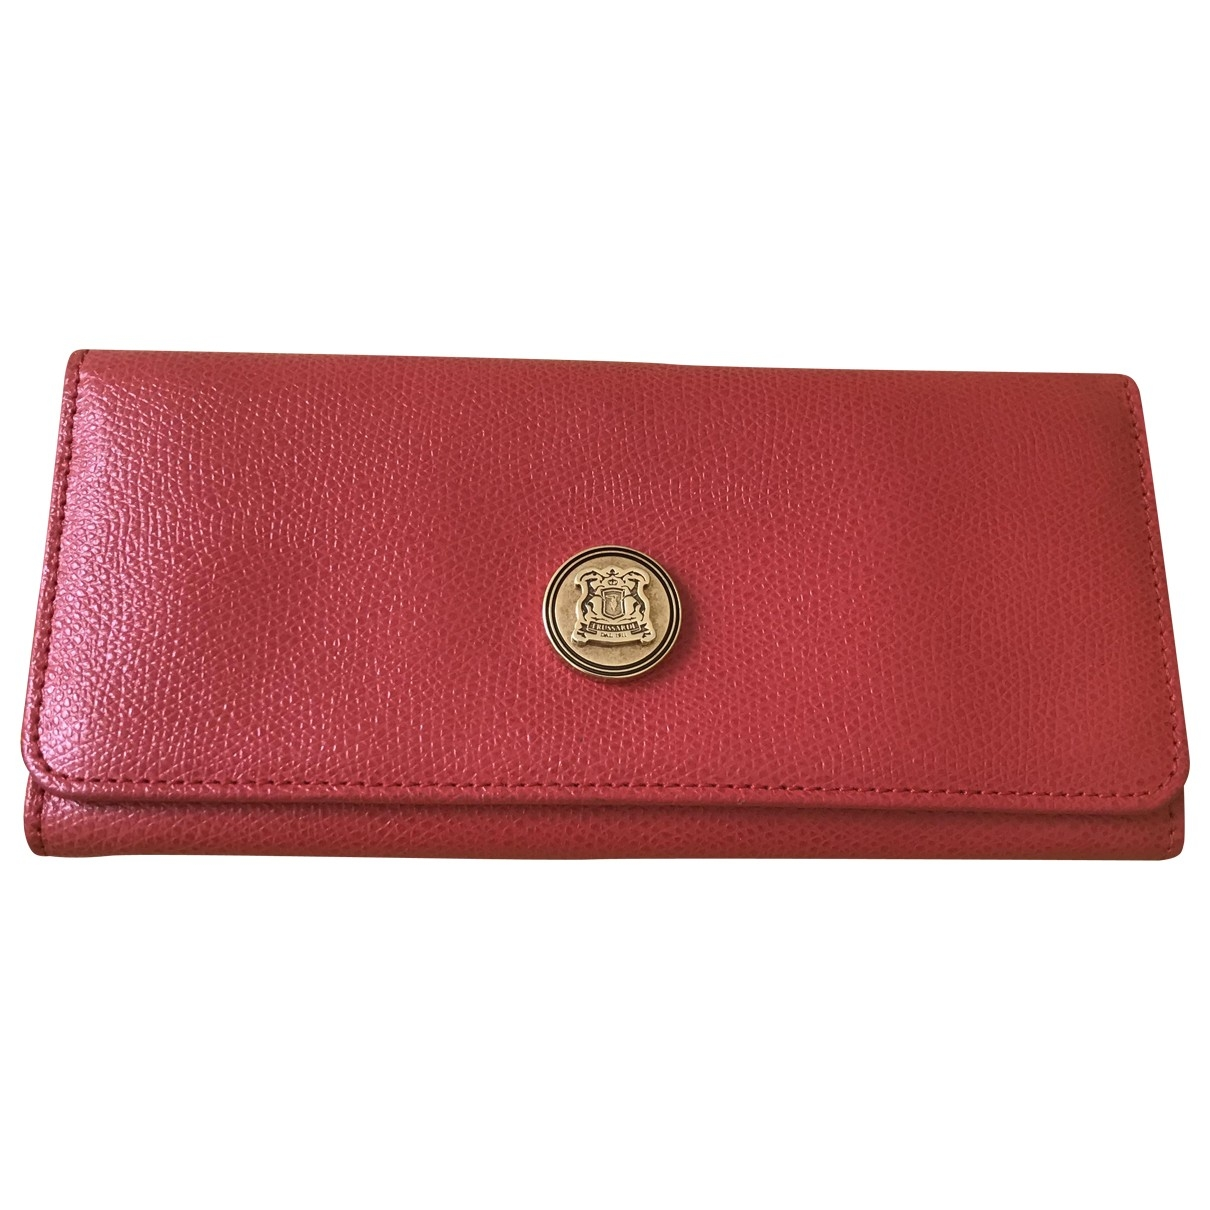 Trussardi \N Red Leather wallet for Women \N